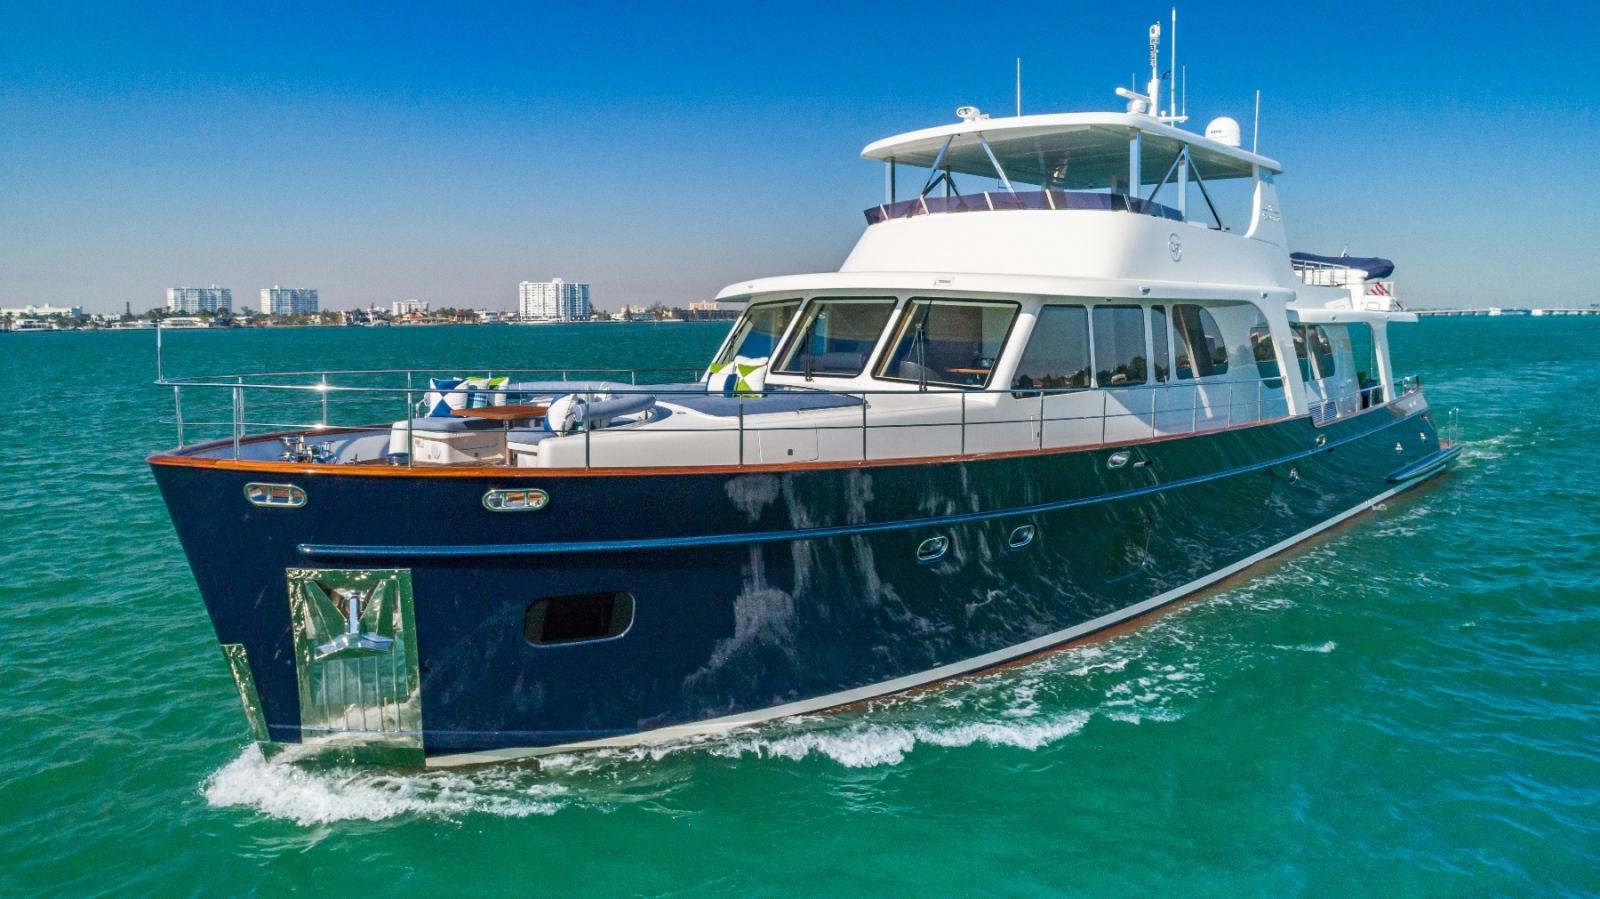 moni yacht charter details vicem charterworld luxury. Black Bedroom Furniture Sets. Home Design Ideas